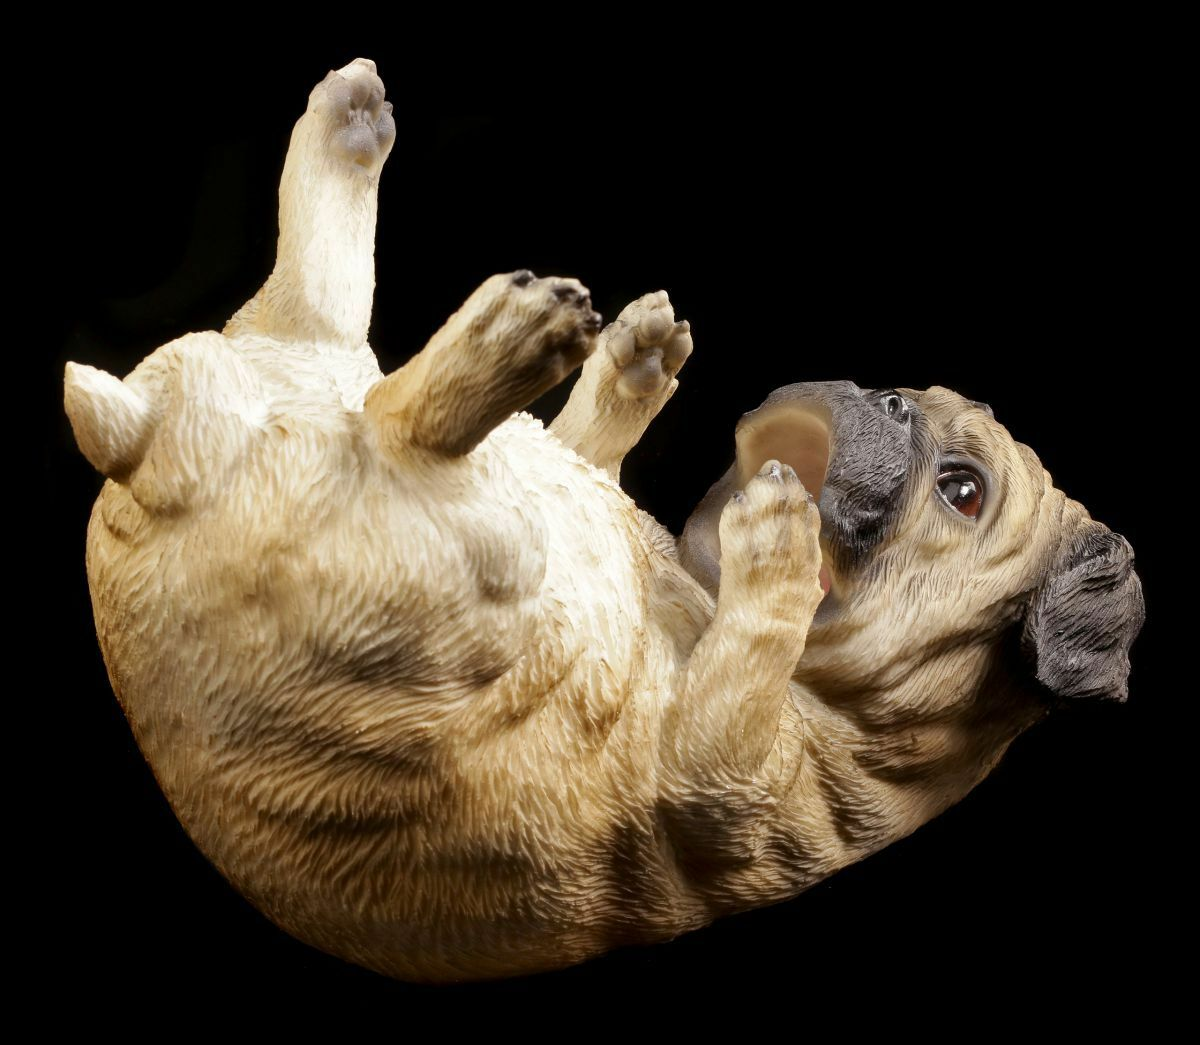 2er Set  Dekofigur Hund wie echt *Mops lebensgroß* Kunstharz beige  je 32 cm